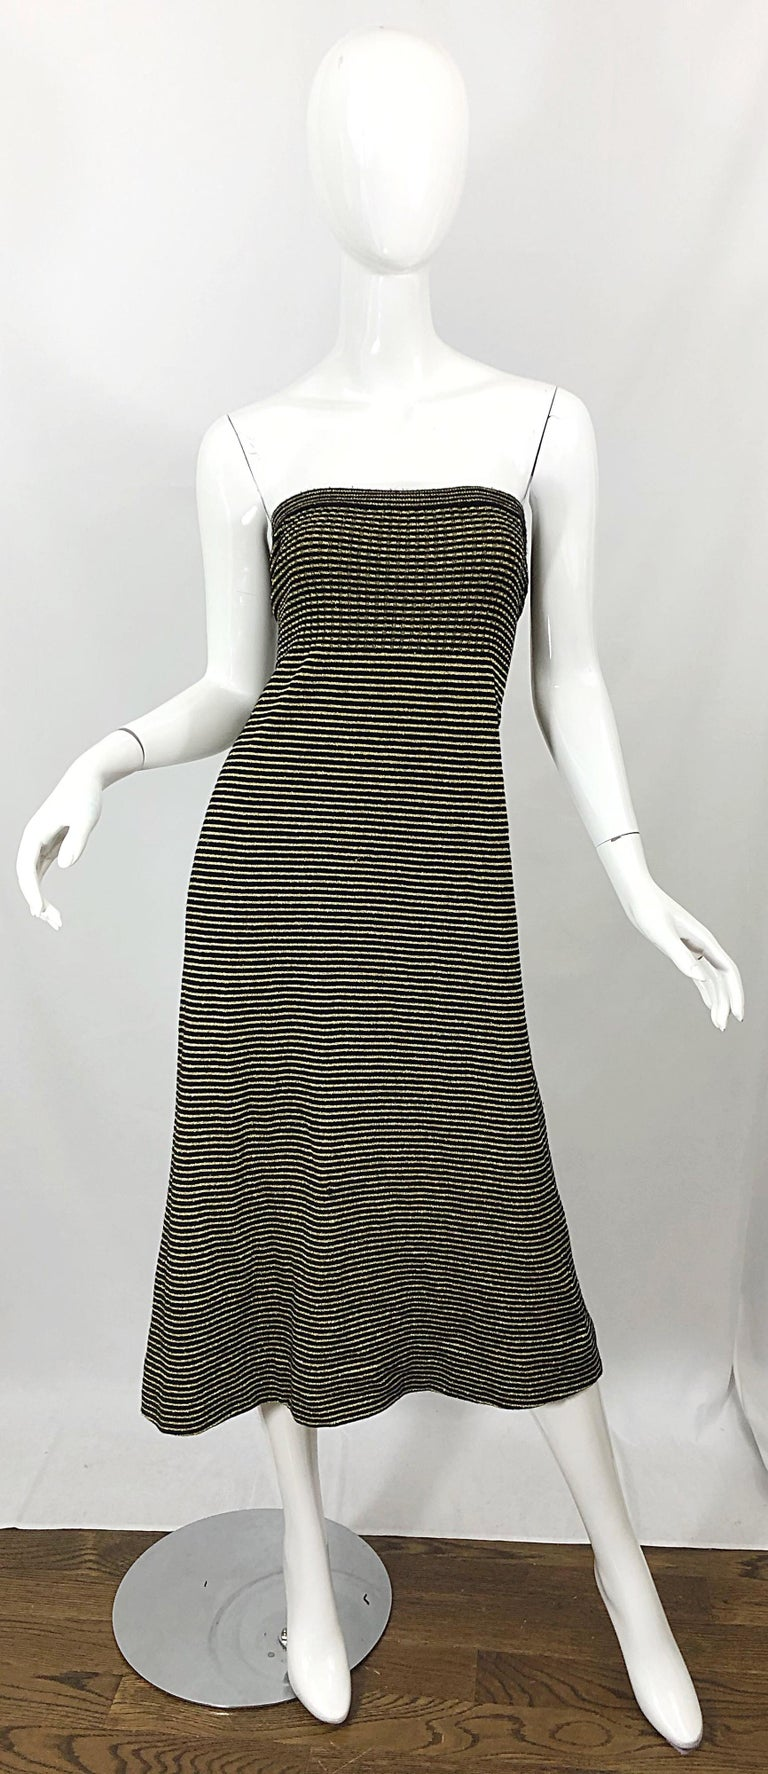 Vintage Yves Saint Laurent YSL 70s Gold Black Strapless Knit Dress or Maxi Skirt For Sale 10